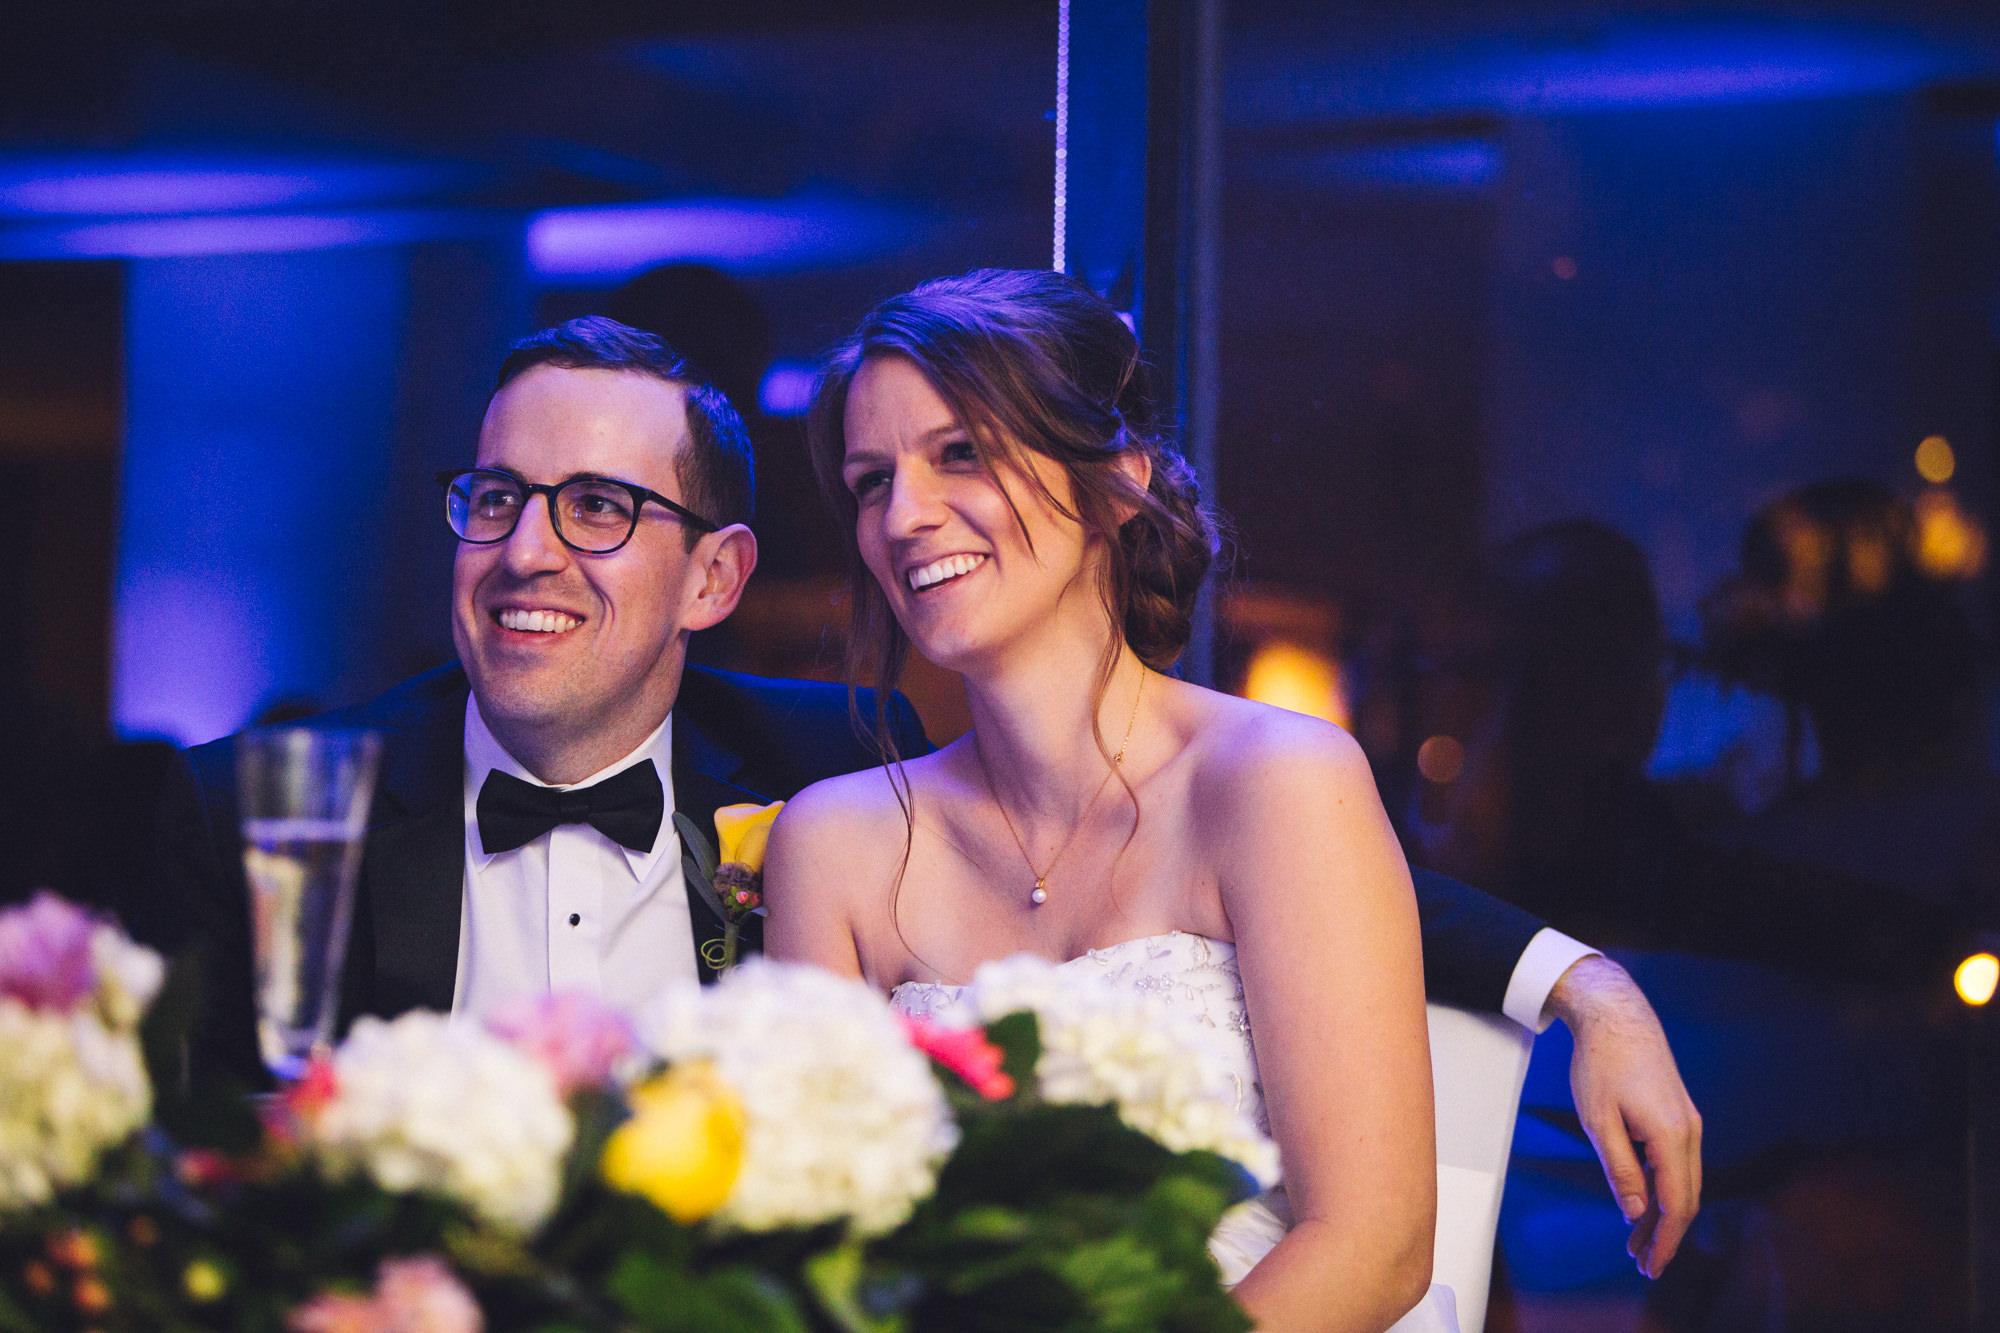 thelightandglass-wedding-engagement-photography-244.jpg